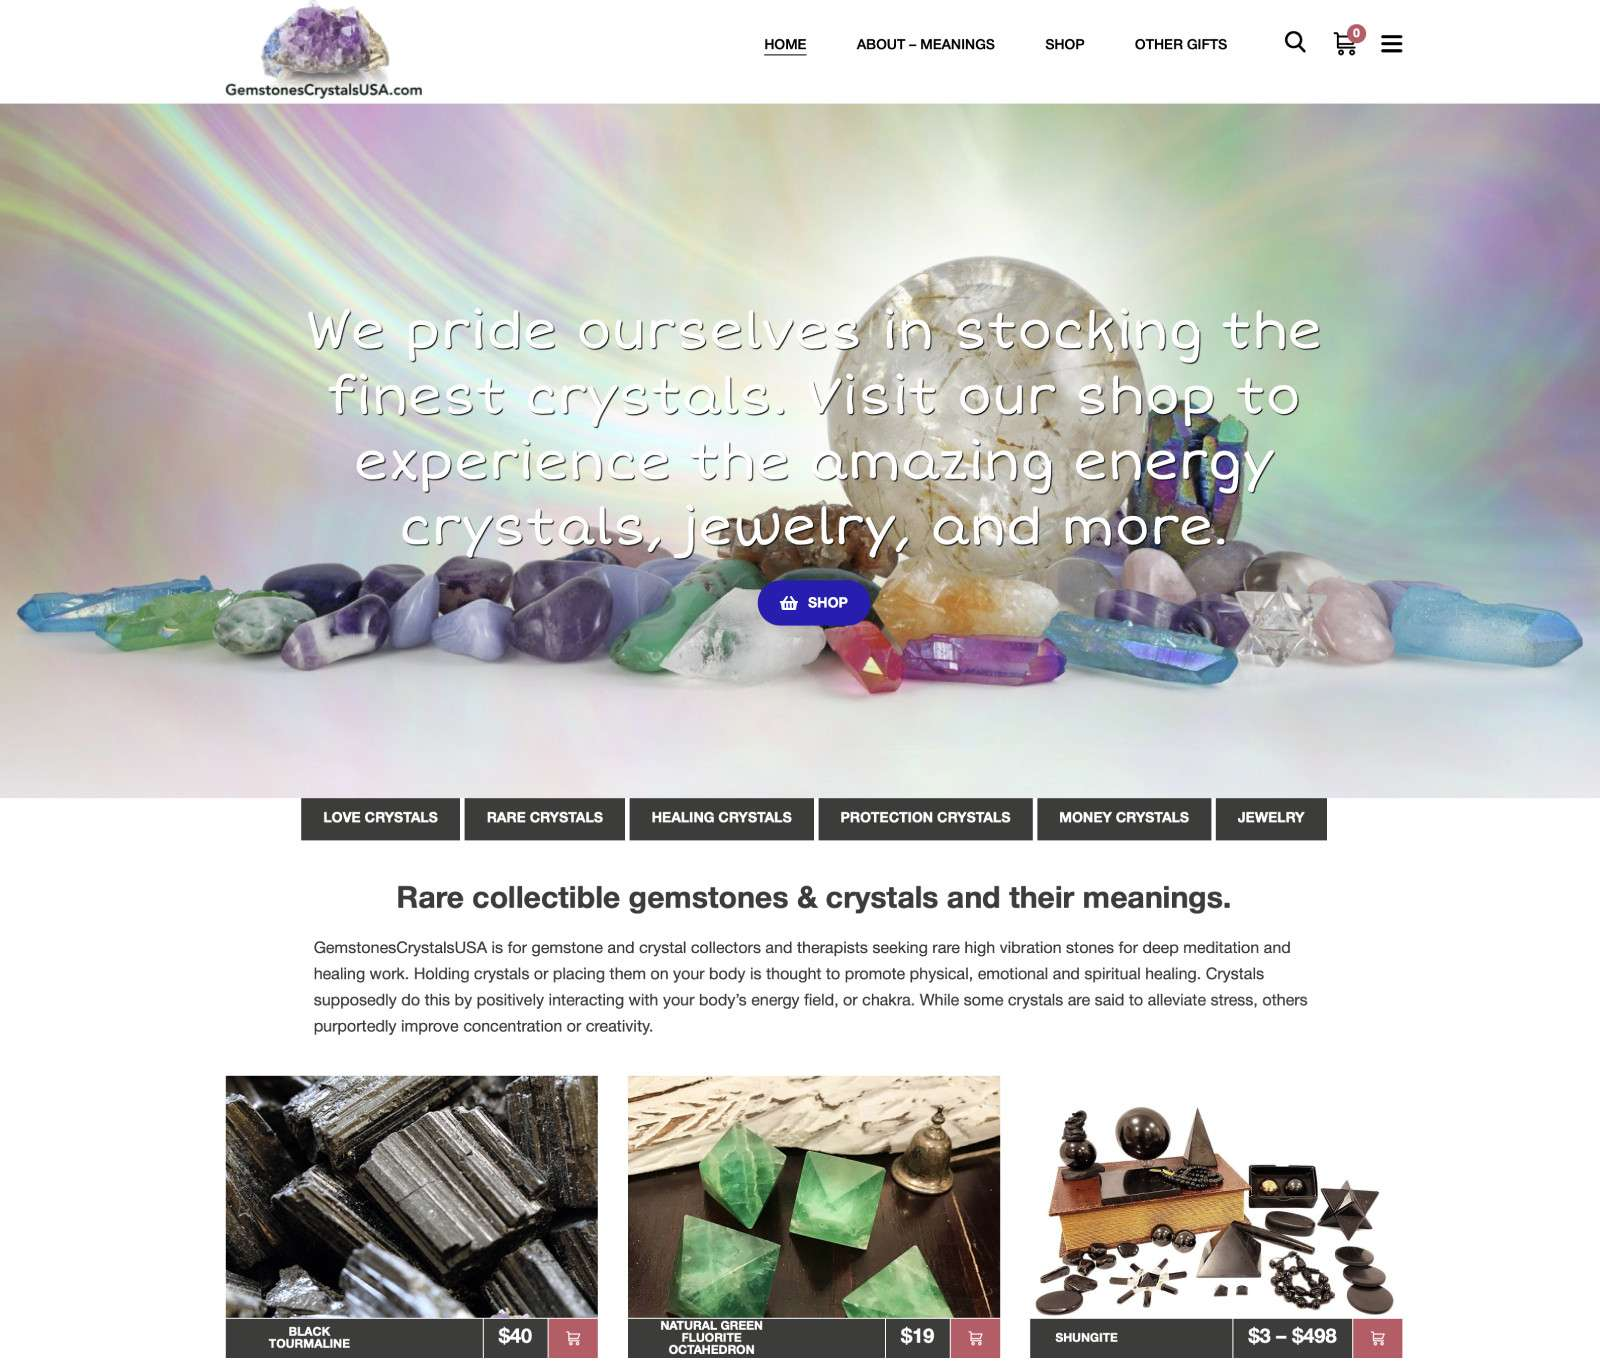 2020 New Website Design & SEO